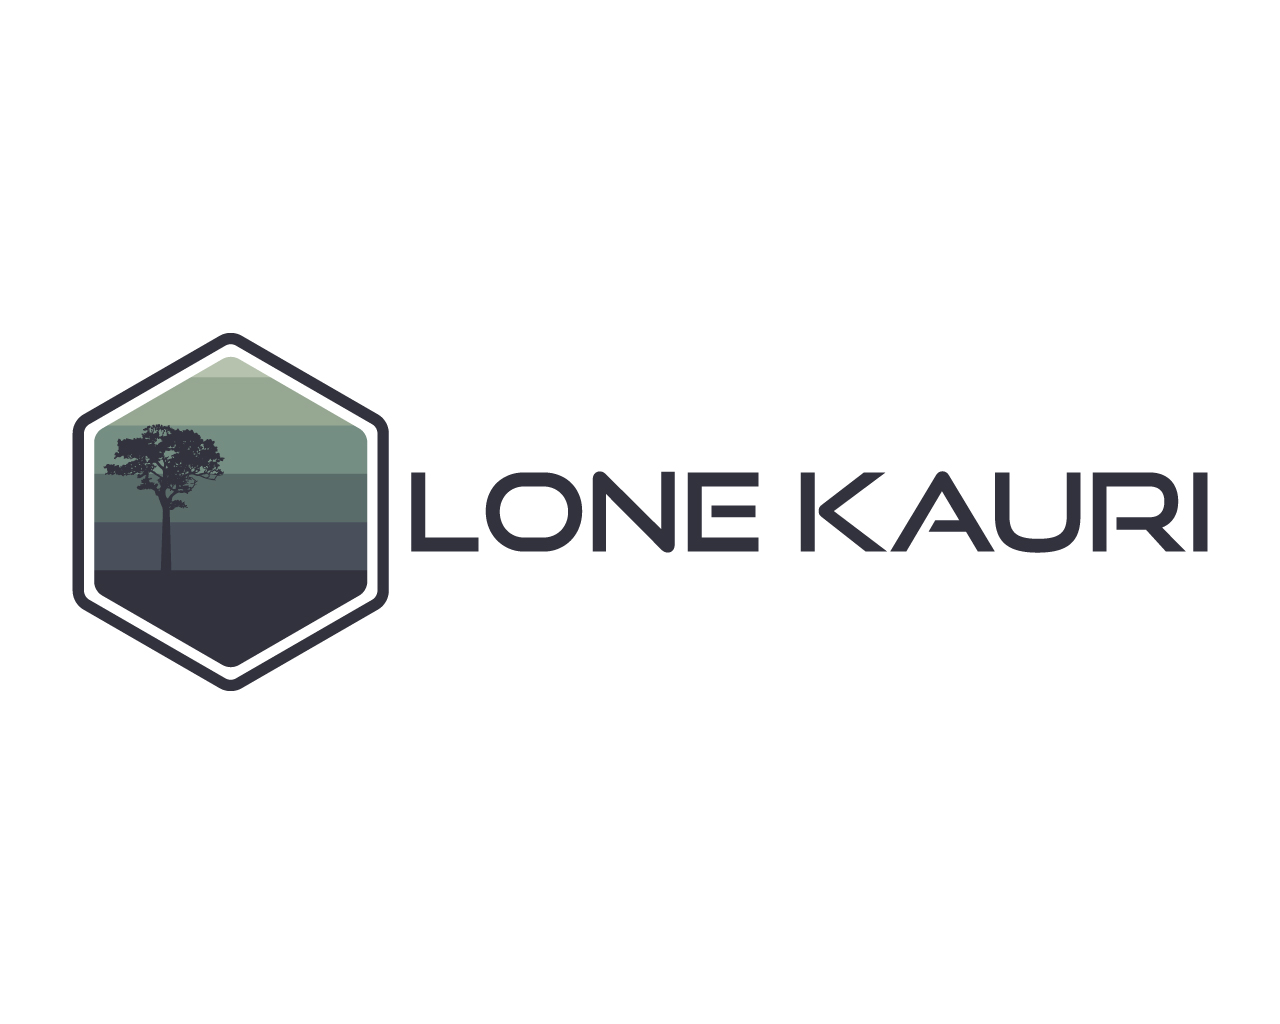 LONE-KAURI